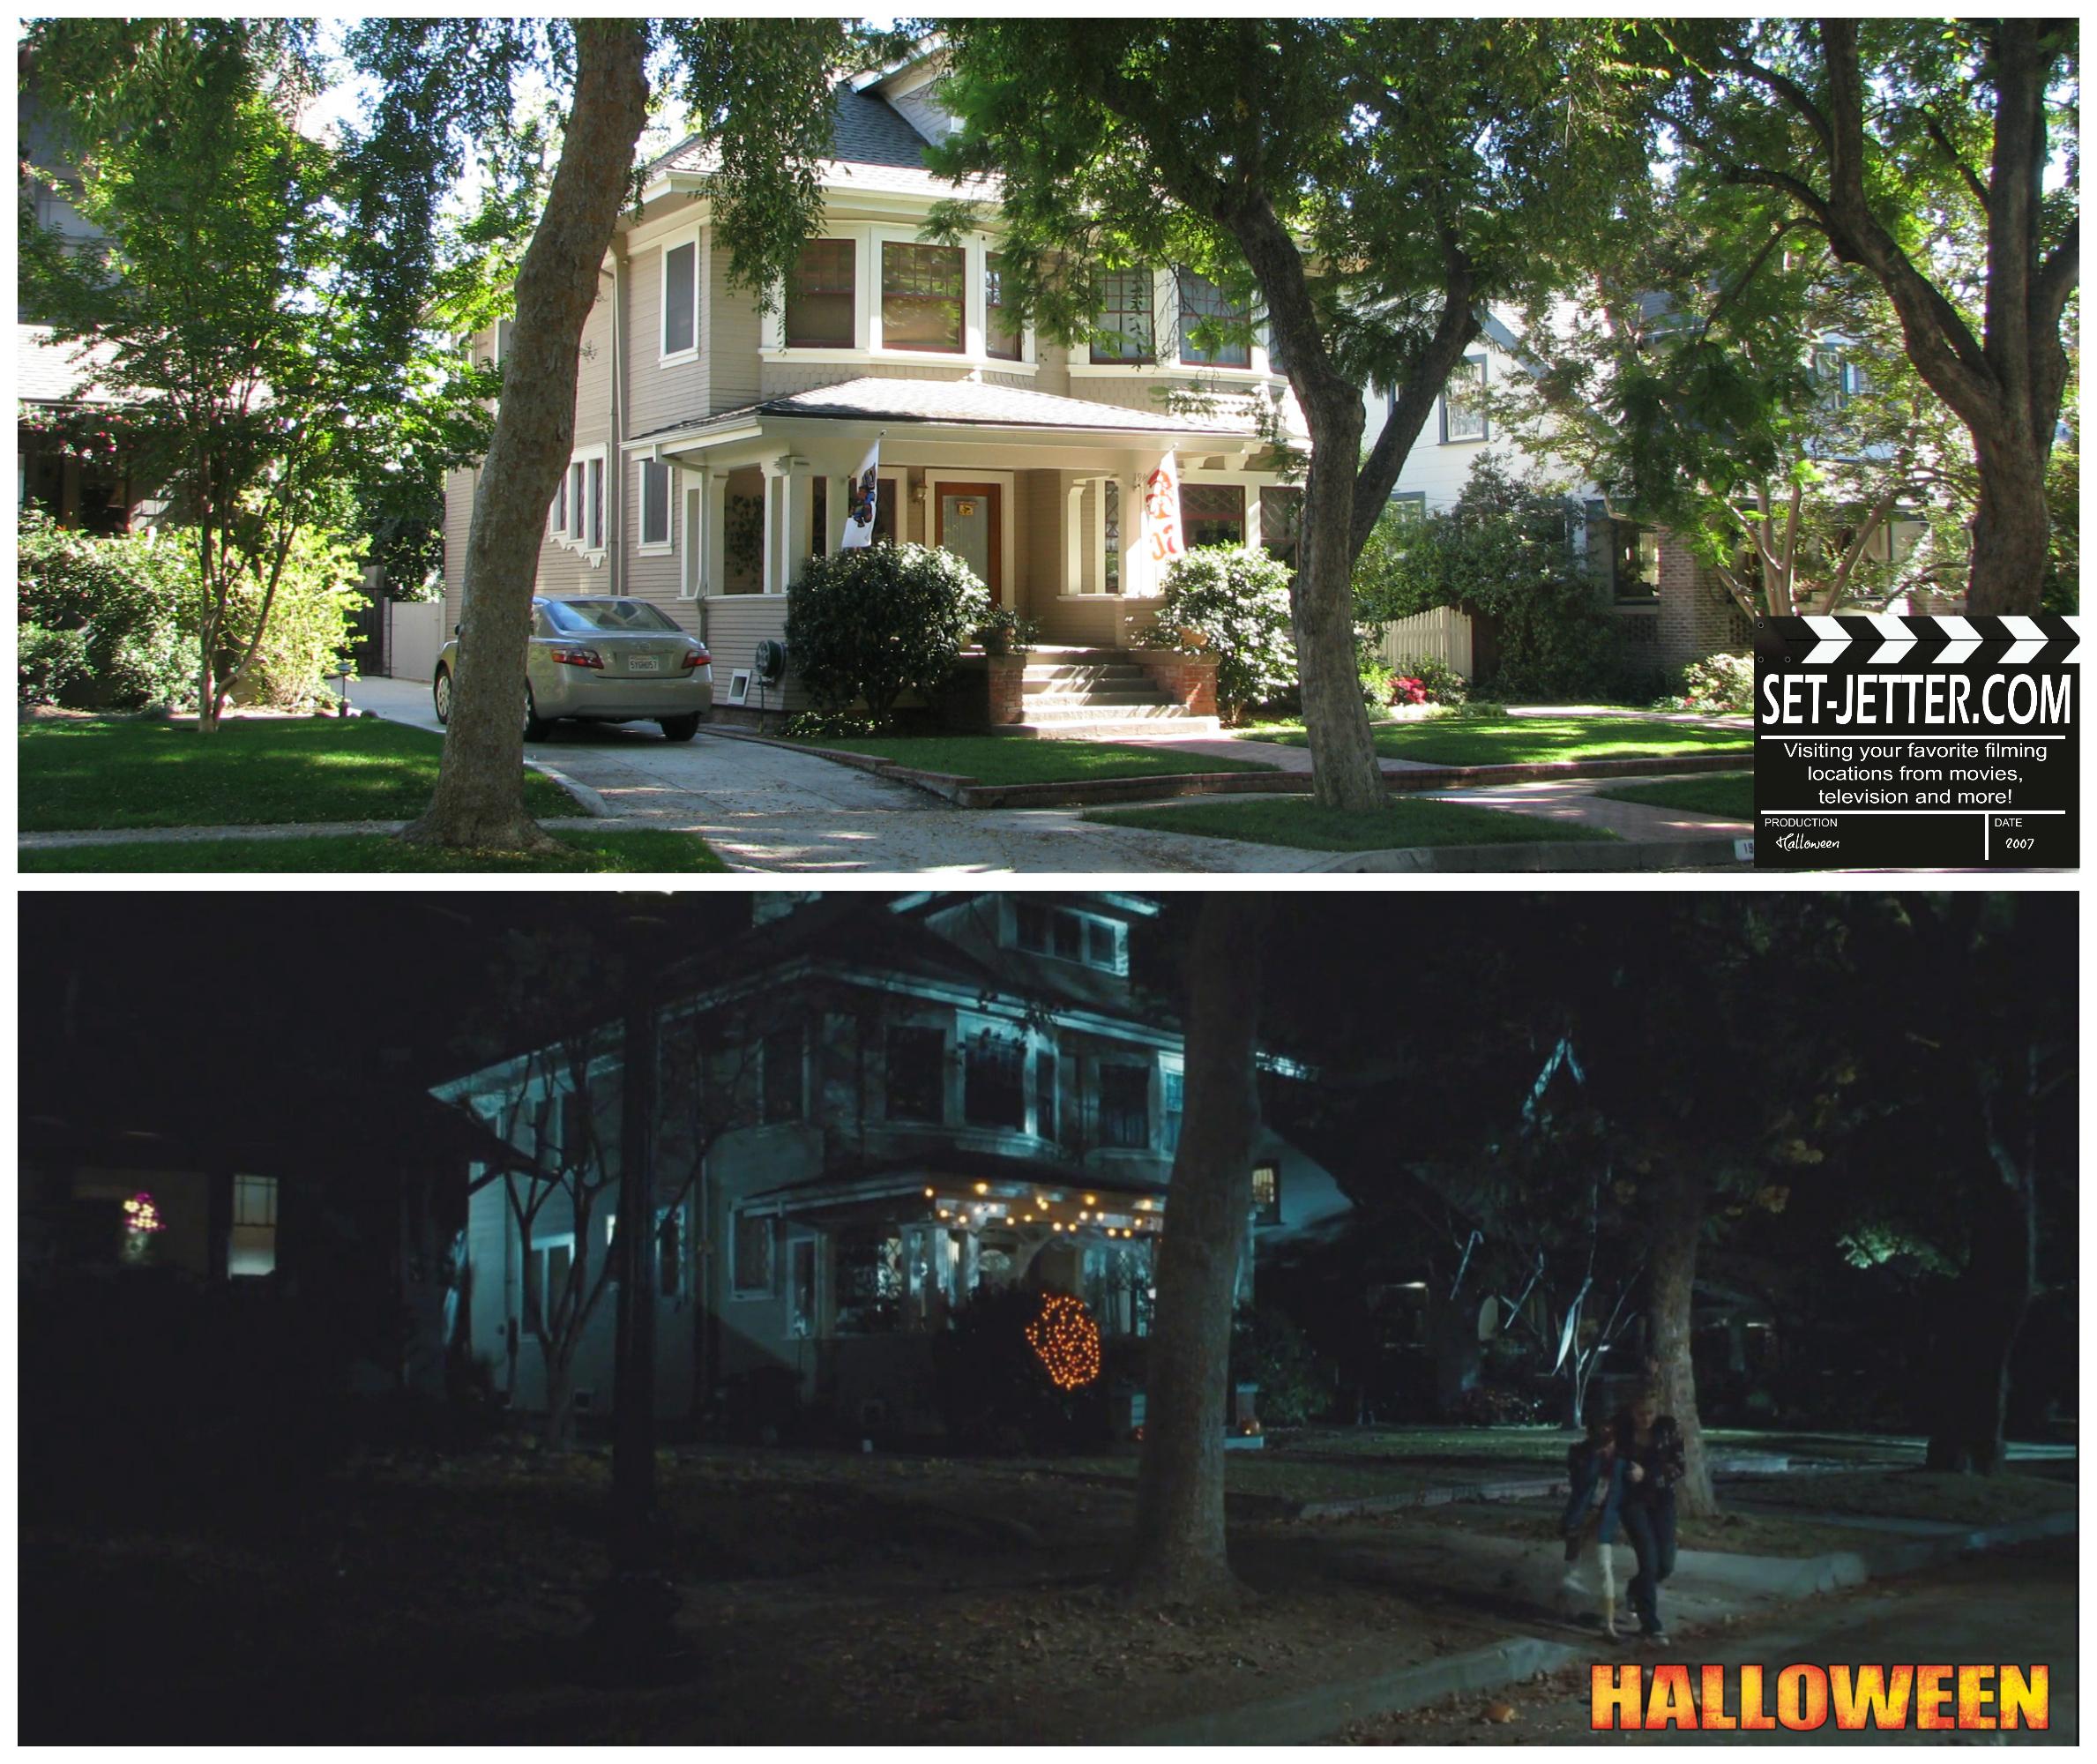 Halloween 2007 comparison 55.jpg